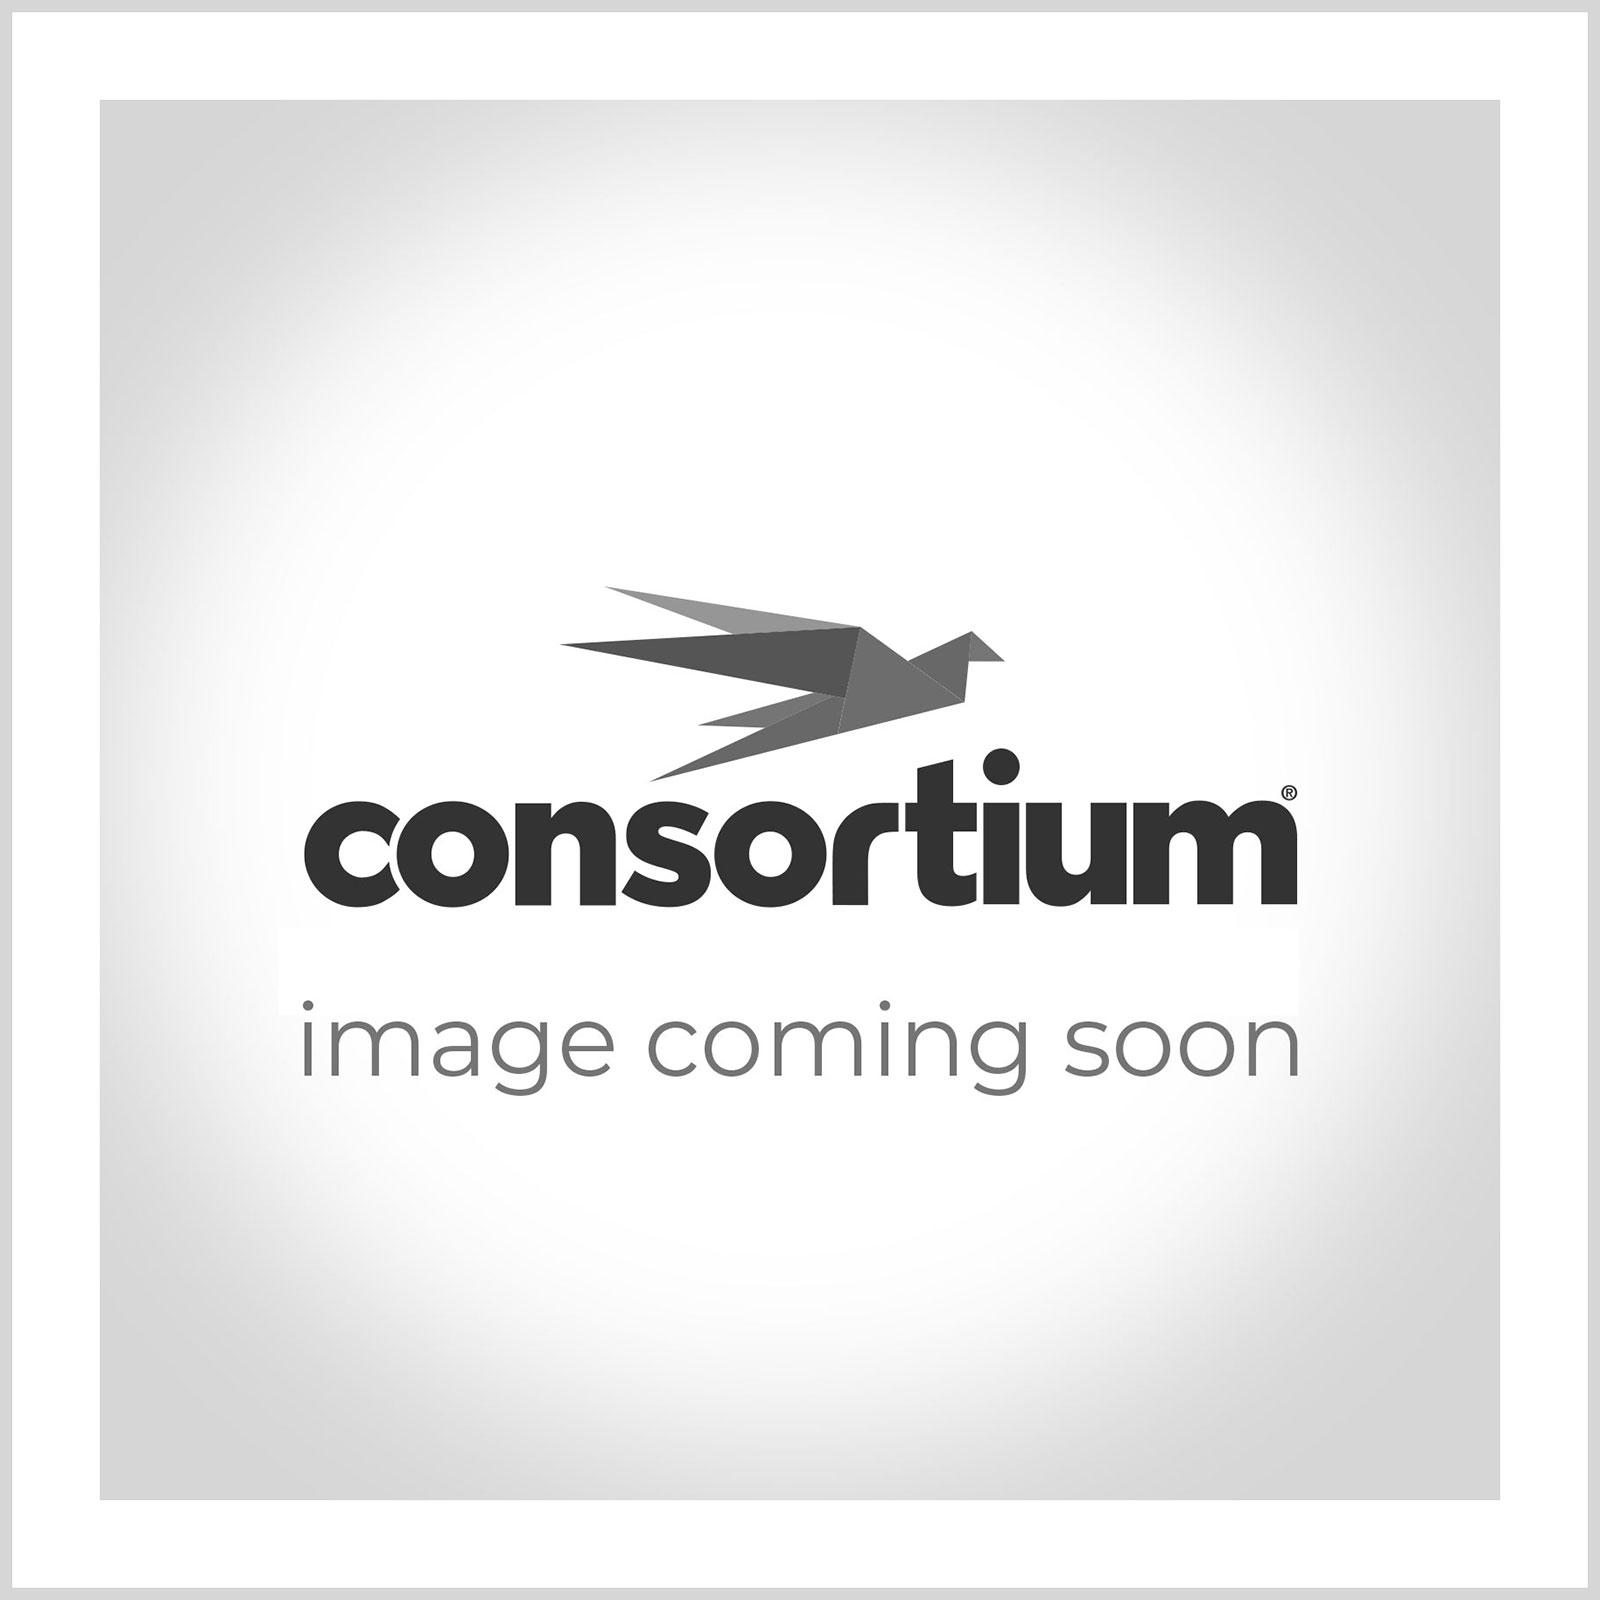 Consortium Disinfectant Cleaning Solution